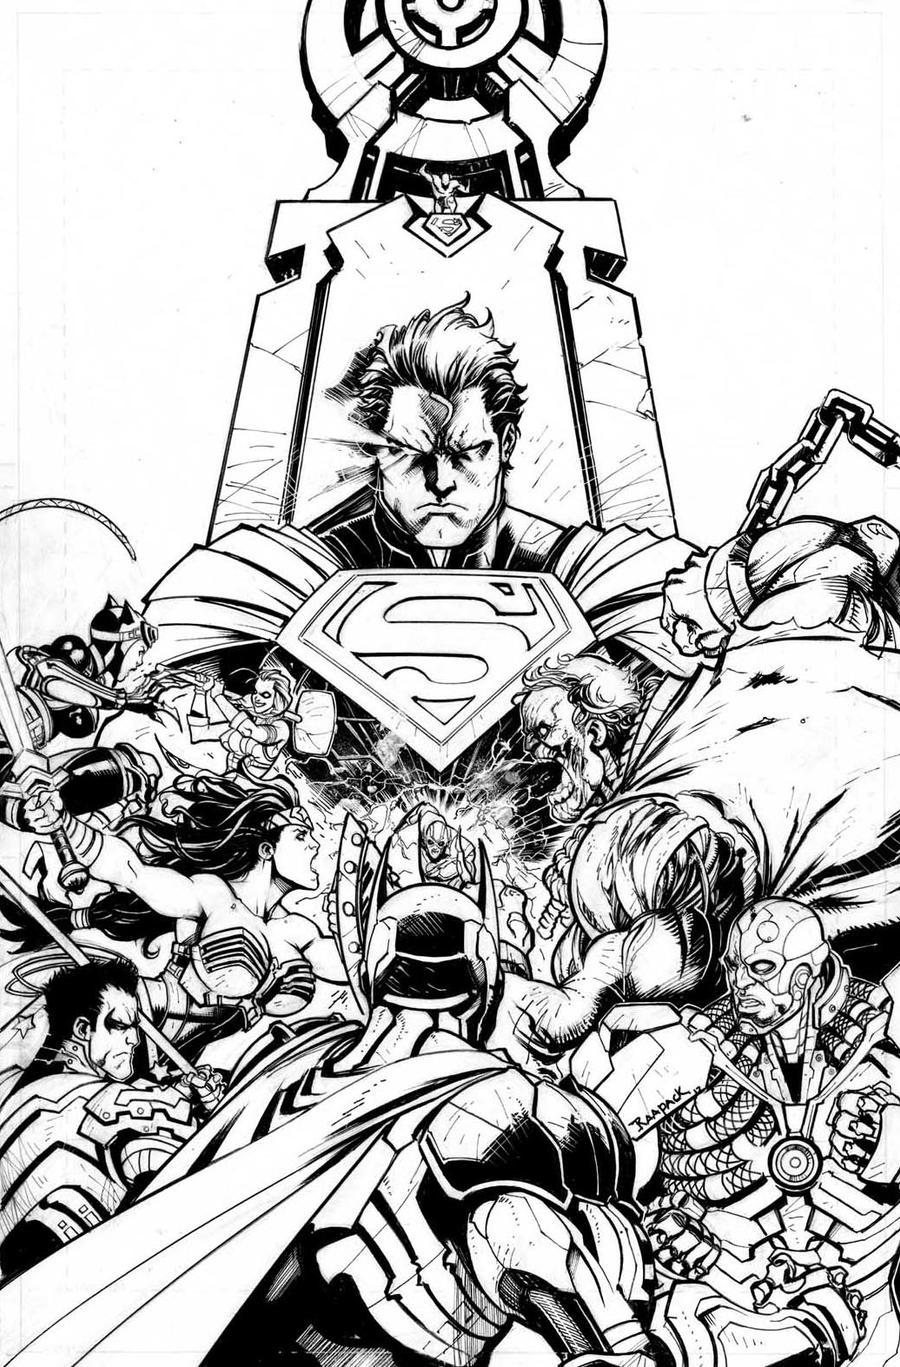 batman vs superman injustice coloring pages | Injustice Gods Among Us #1 by Raapack on DeviantArt